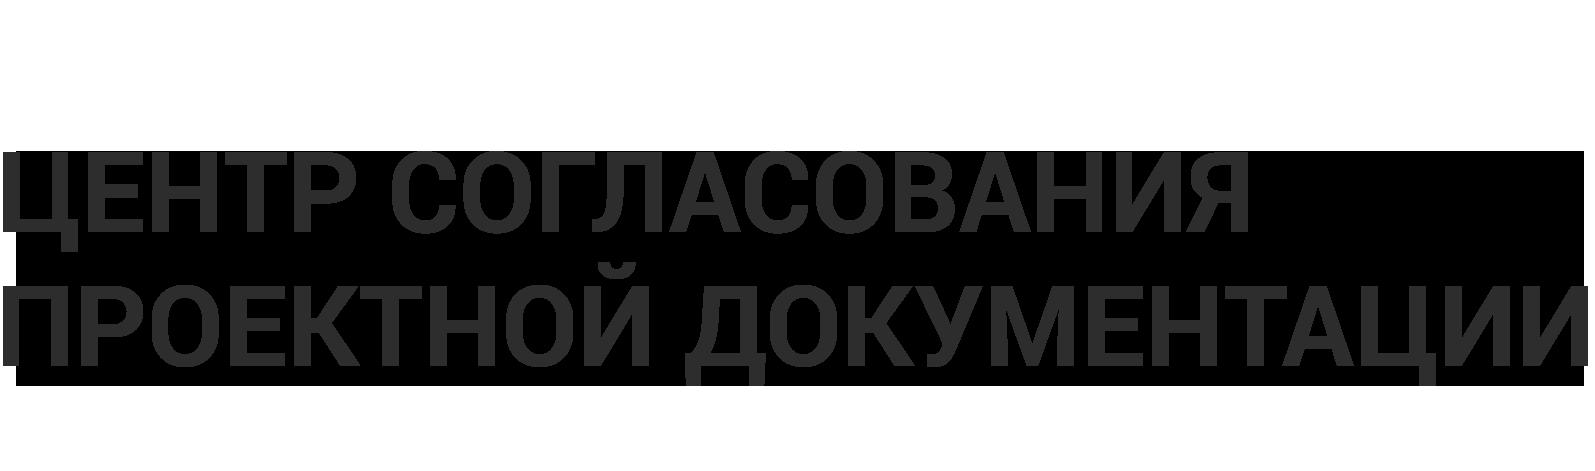 Центр согласования